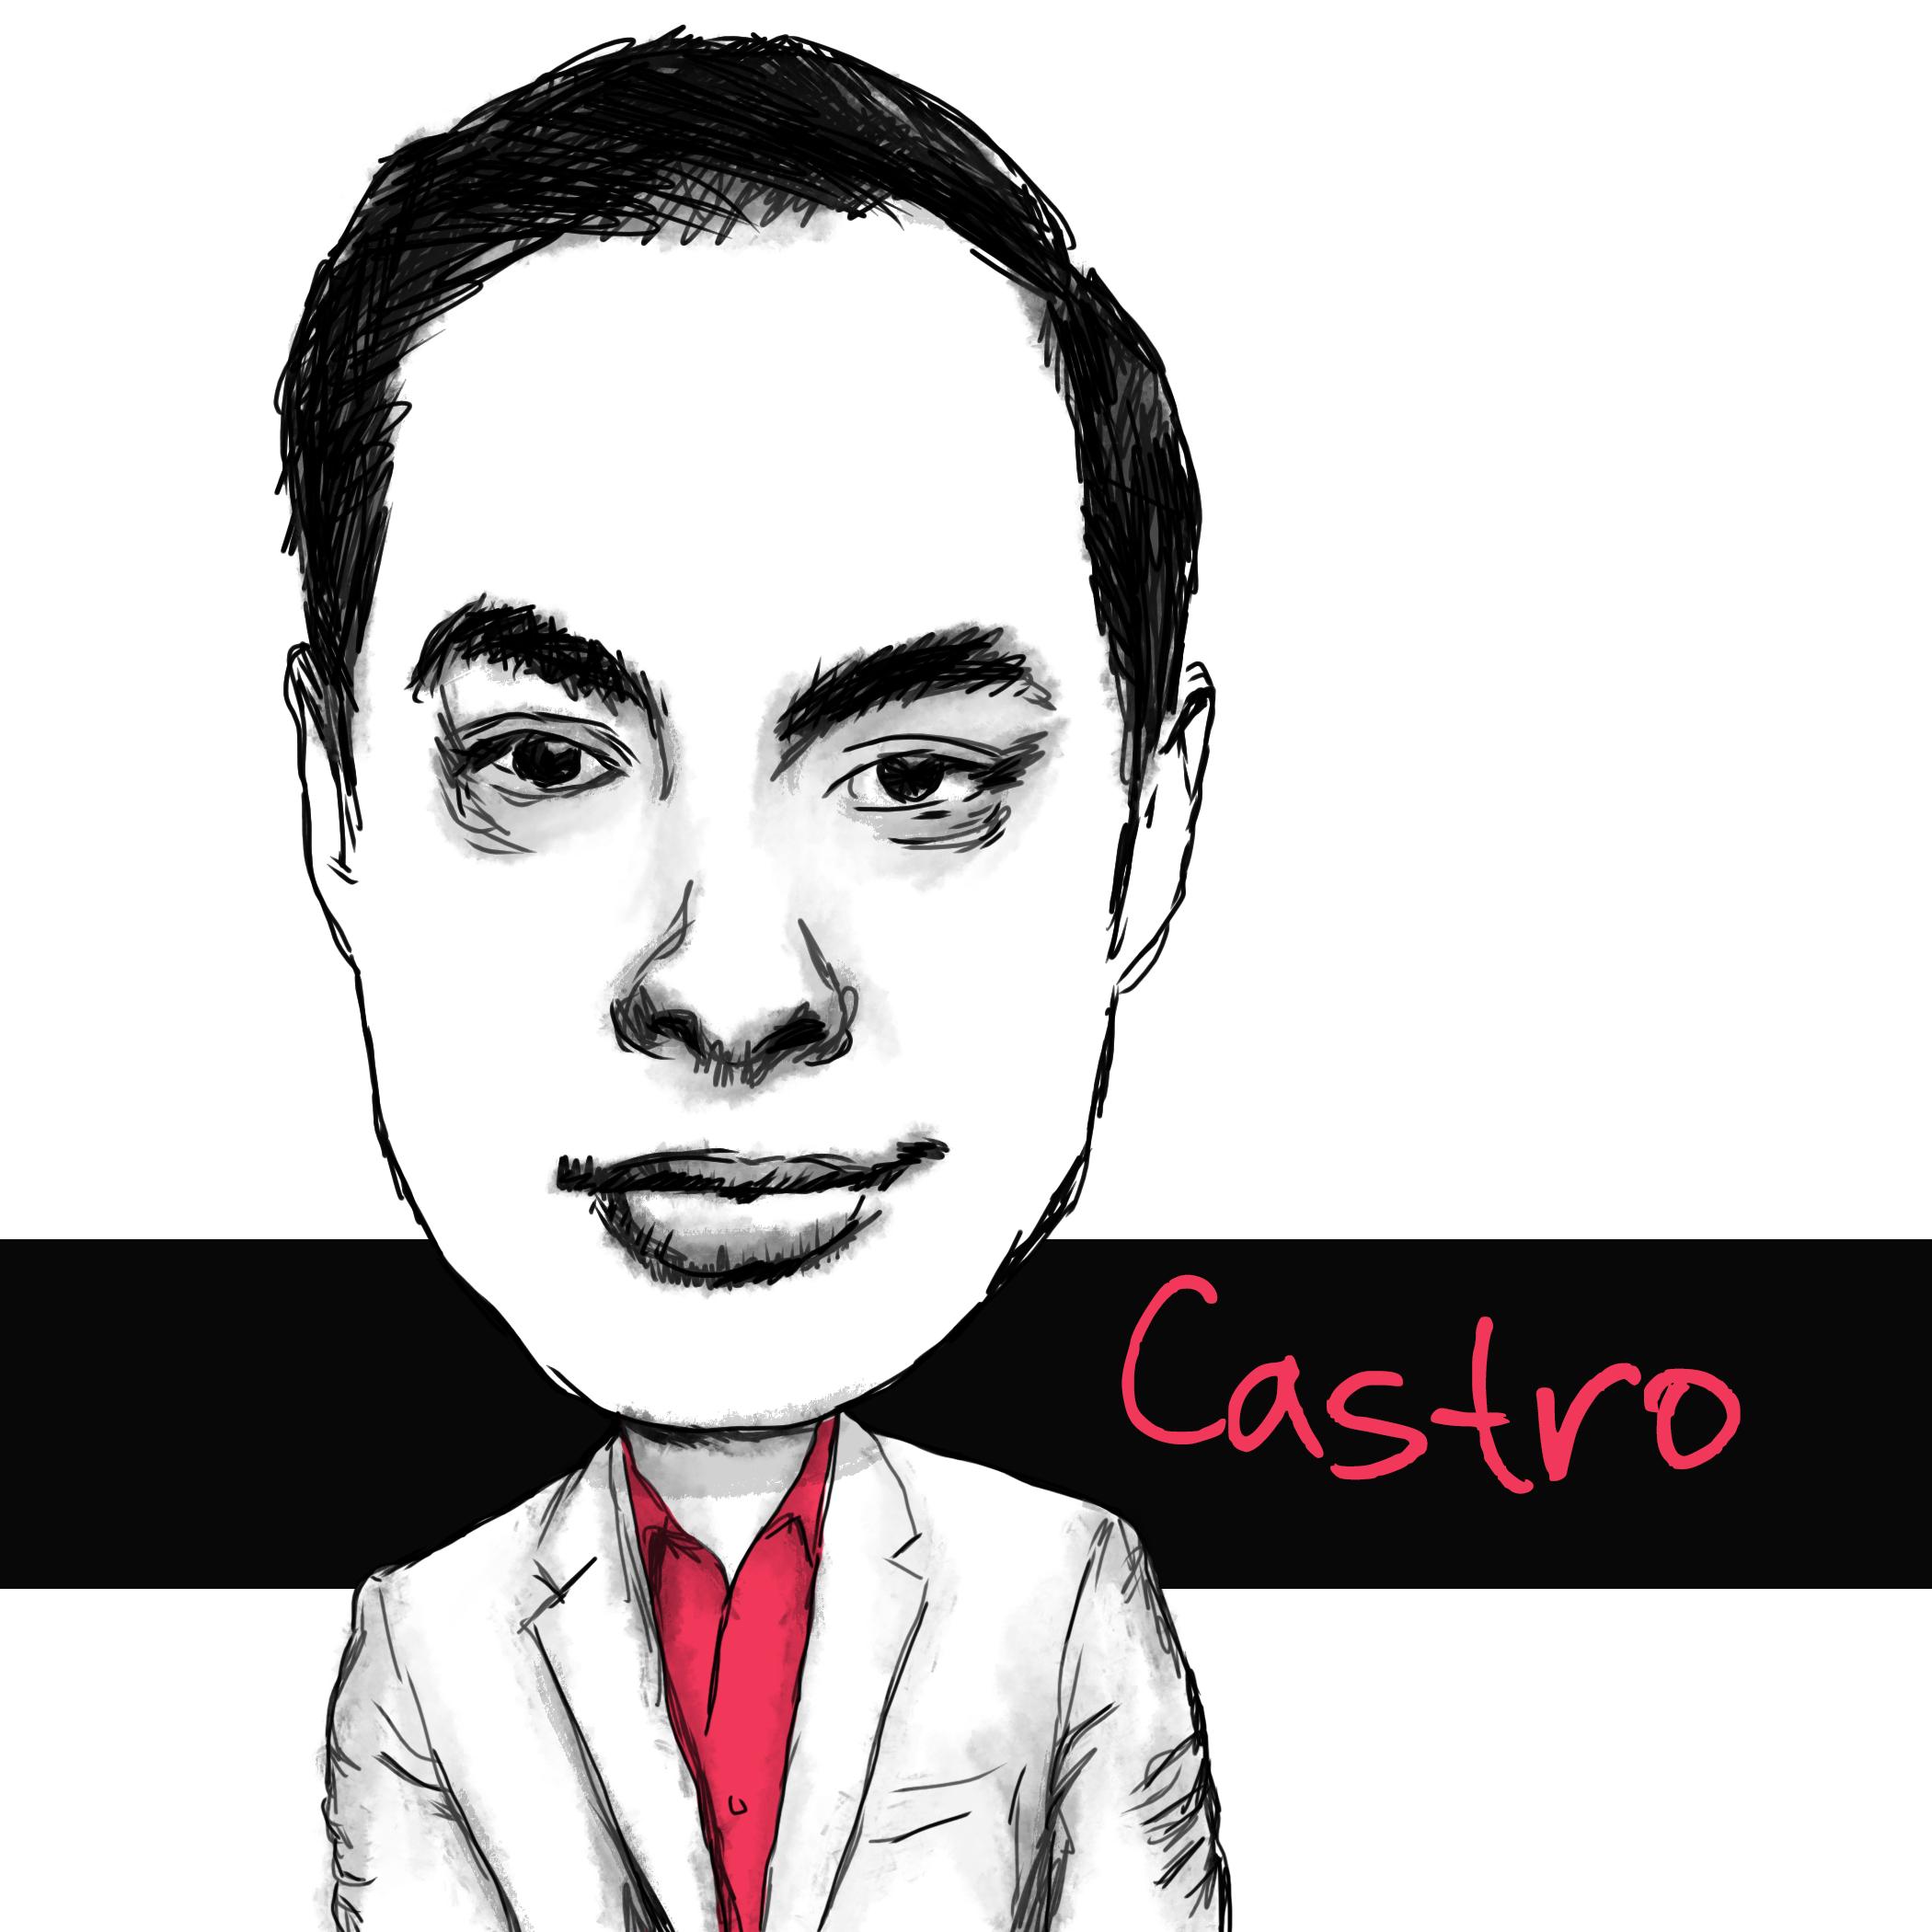 Julián Castro - Julián For The Future - https://www.julianforthefuture.com